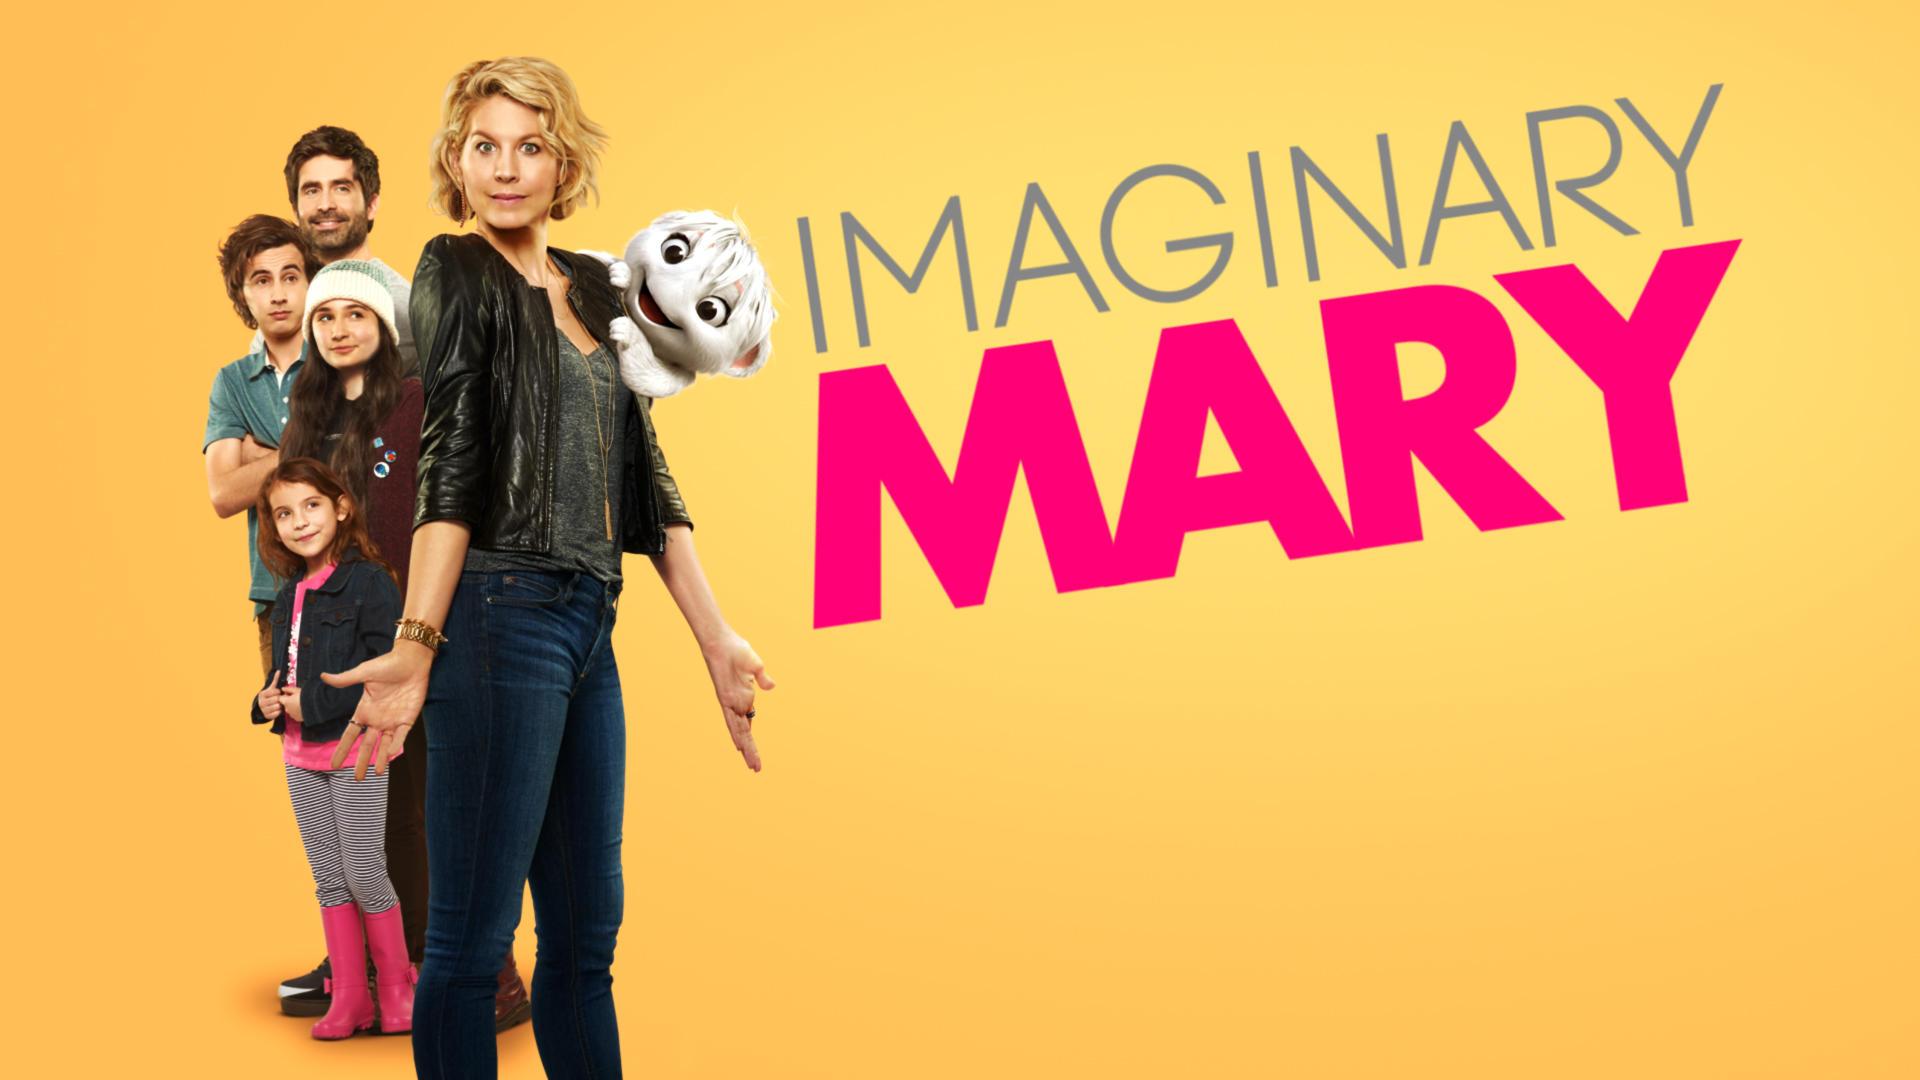 Jenna Elfman Returns to Sitcom TV with IMAGINARY MARY